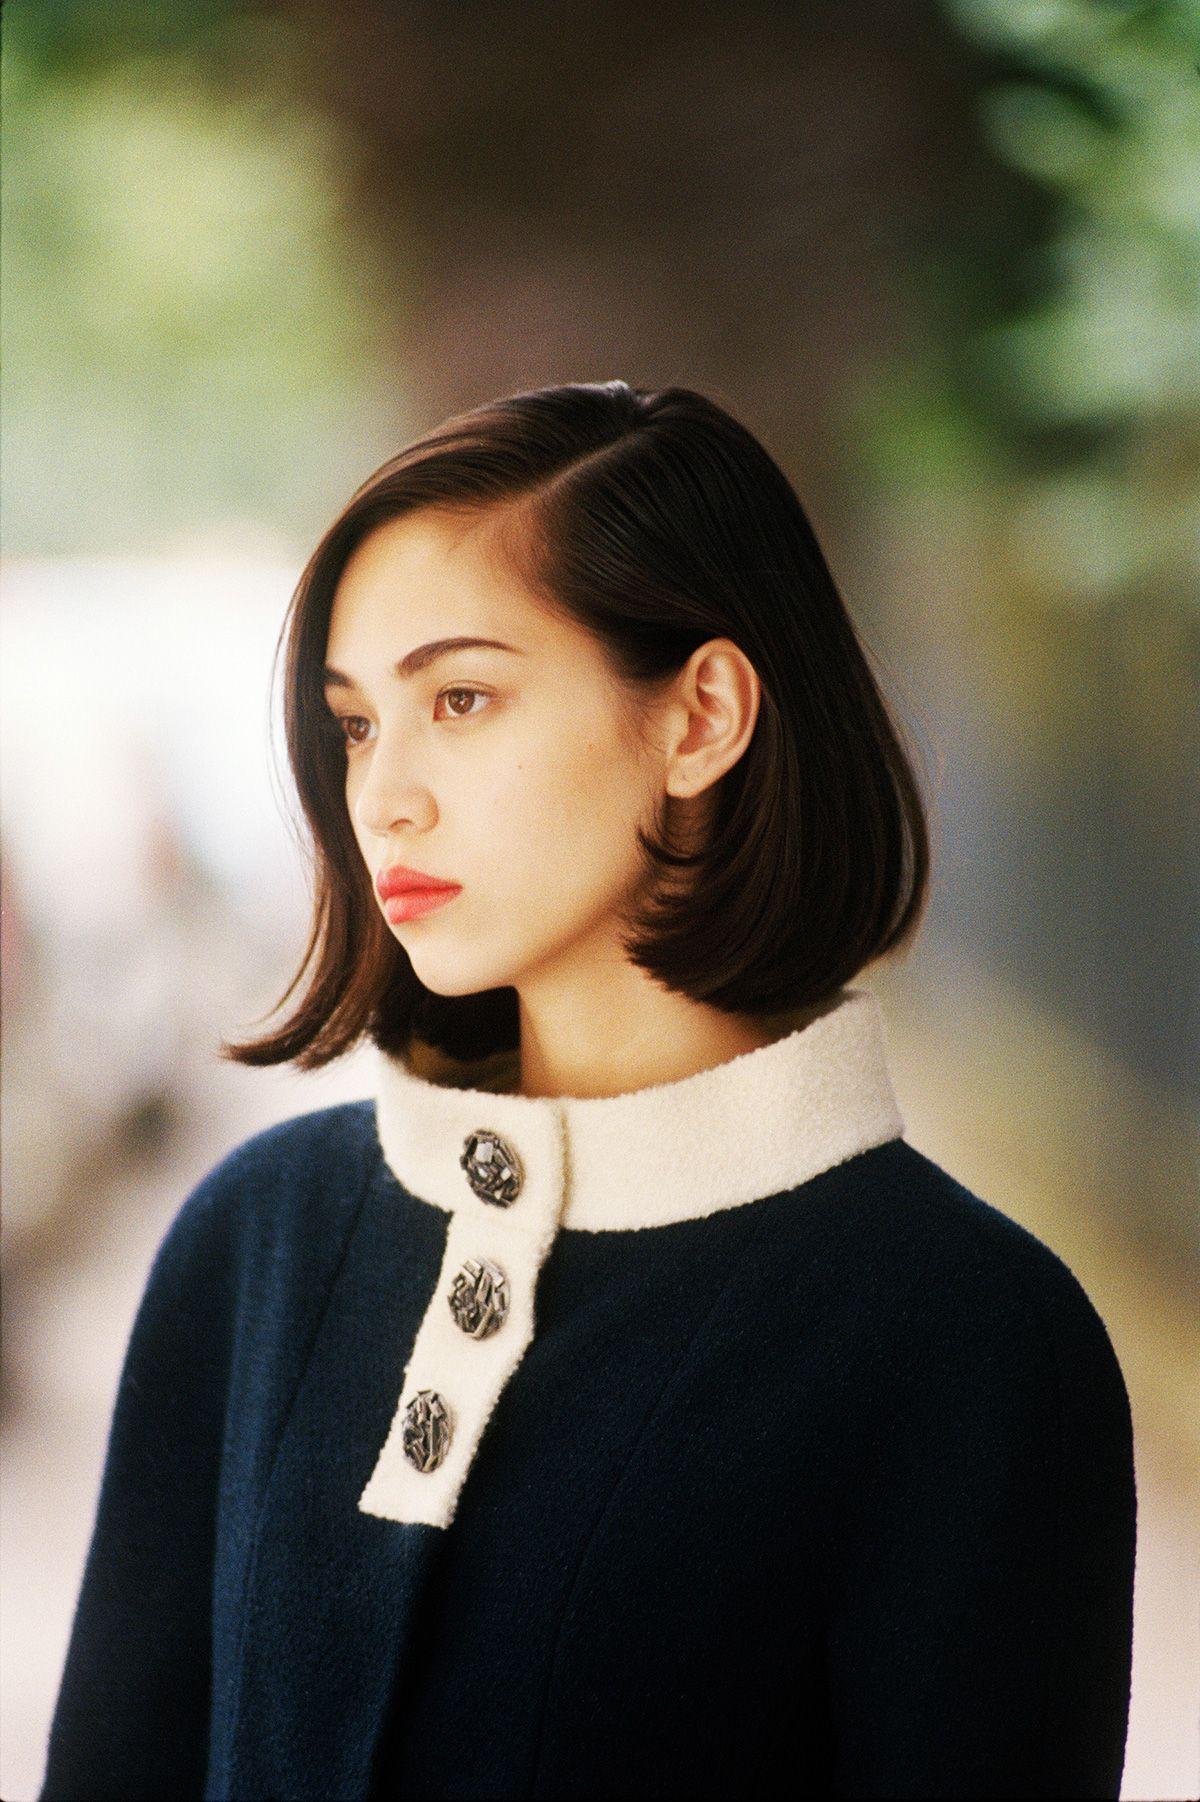 Love the hair cute kiko mizuhara day dreaming pinterest grace